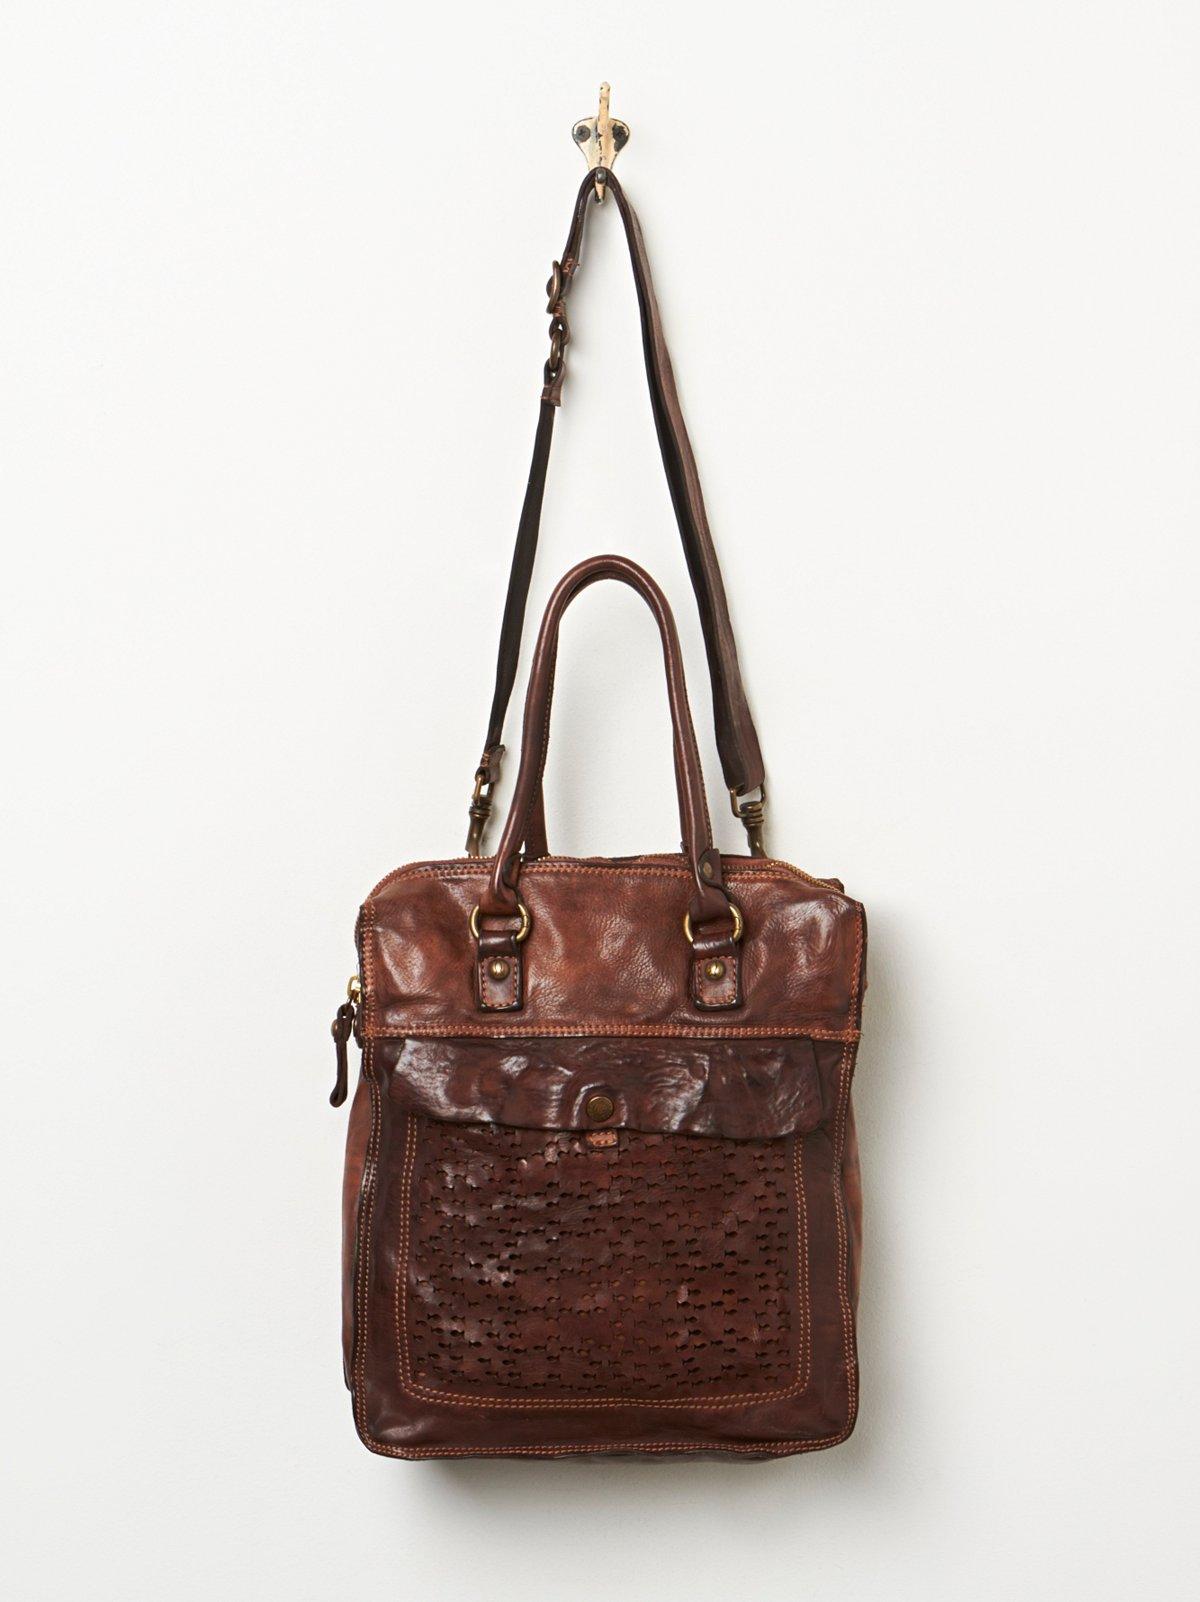 Piero Leather Tote